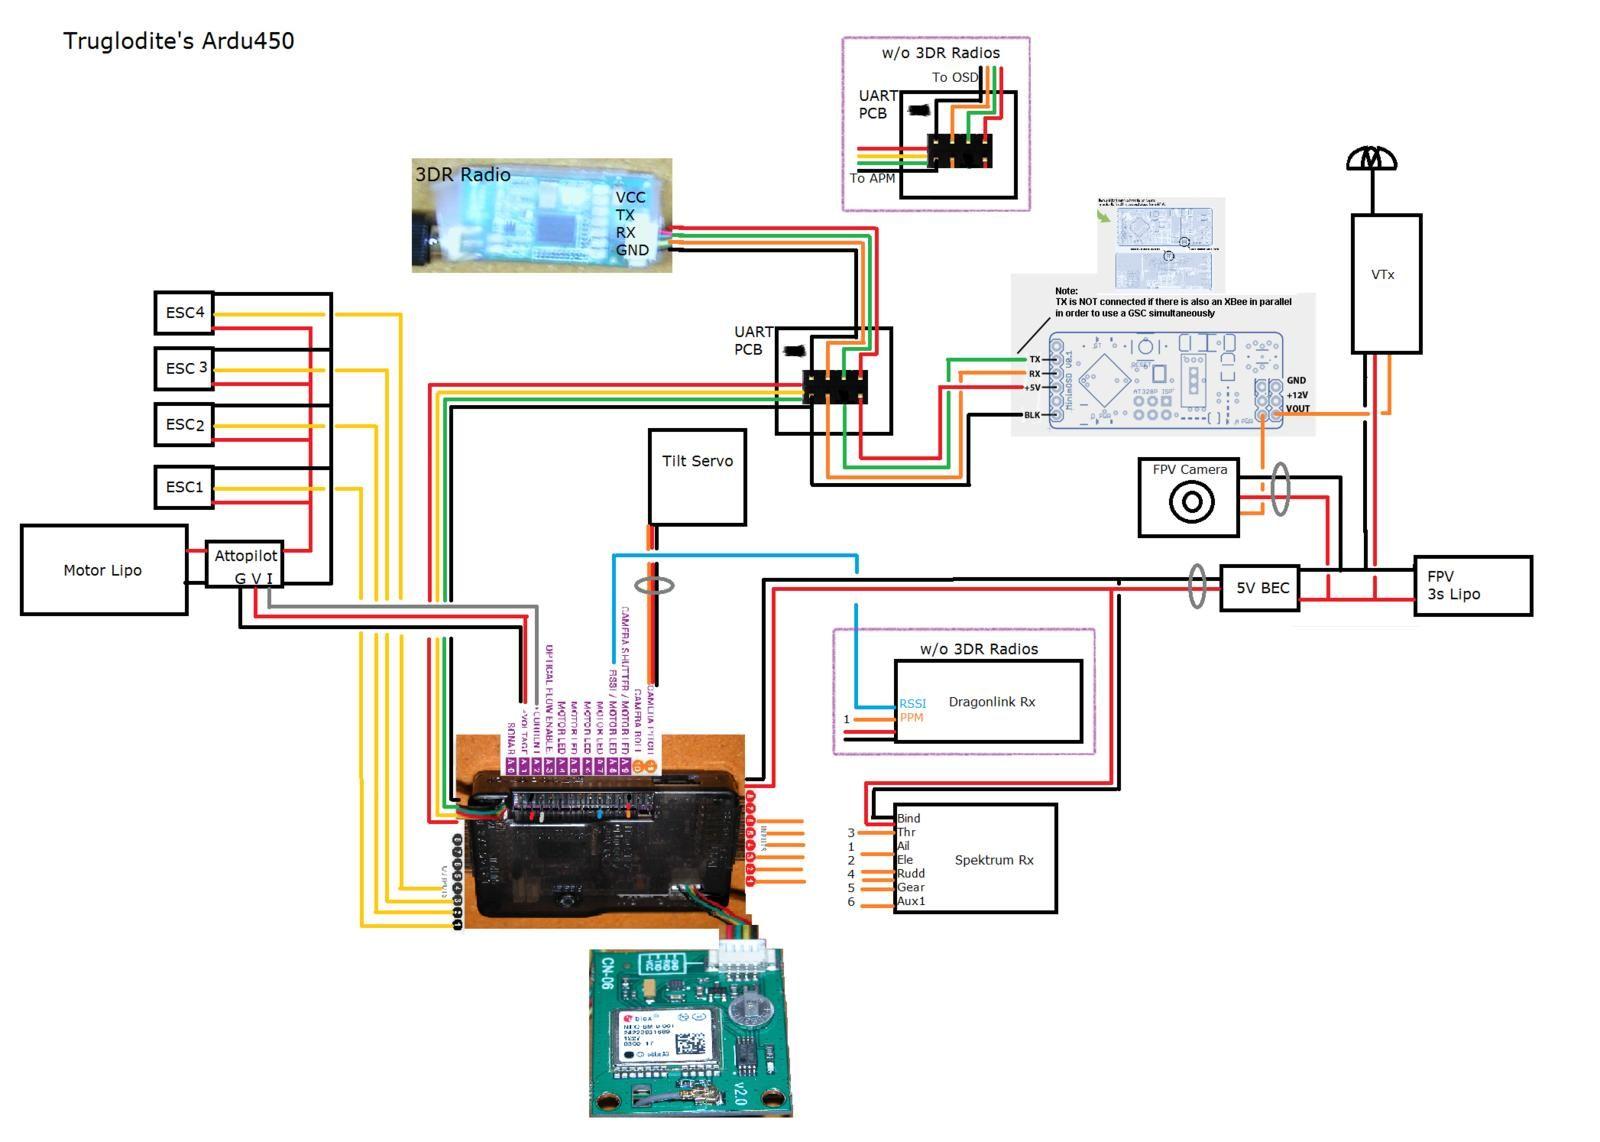 medium resolution of apm 2 5 wiring diagram wiring diagram dat apm 2 5 wiring diagram